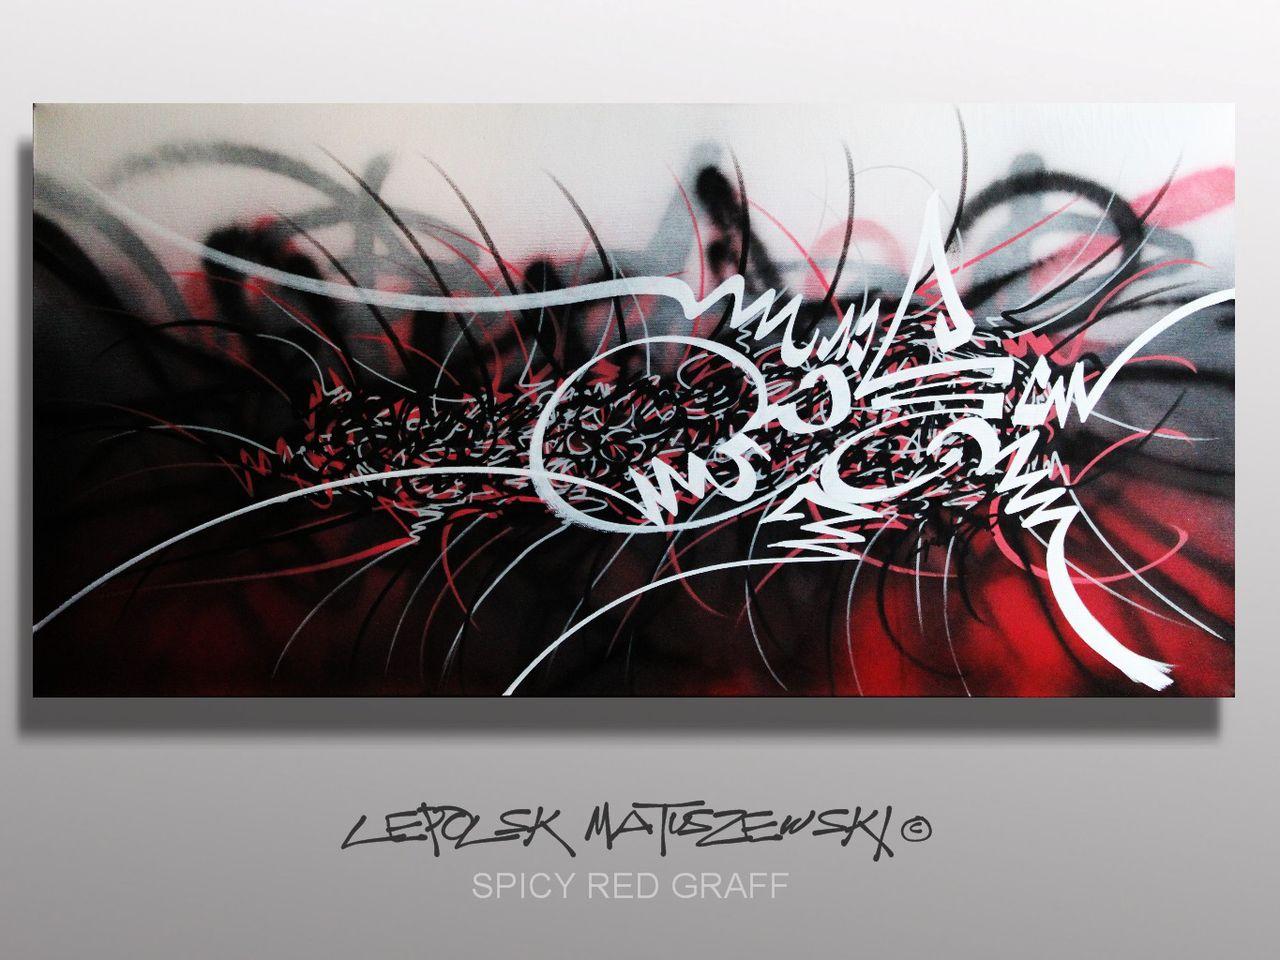 MISTER K  (Lepolsk Matuszewski) SPICY RED GRAFF  street art calligraffiti graffiti abstrait